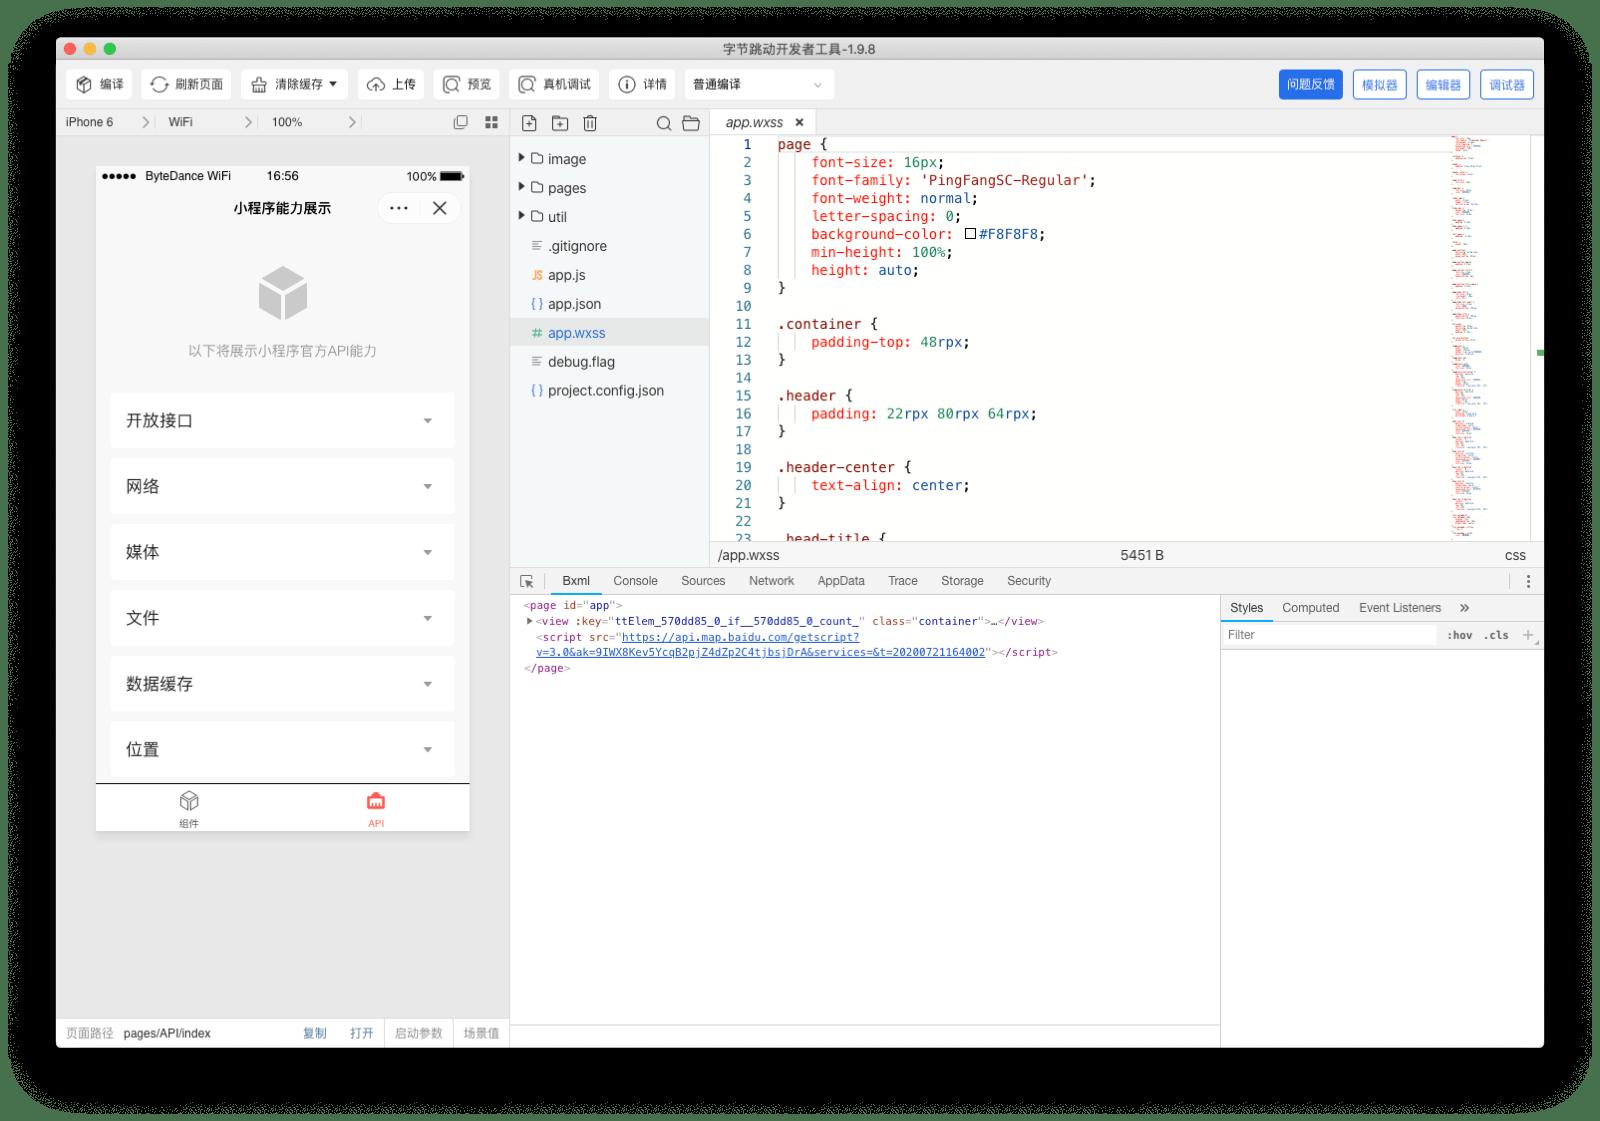 ByteDance DevTools application window showing simulator, code editor, and debugger.